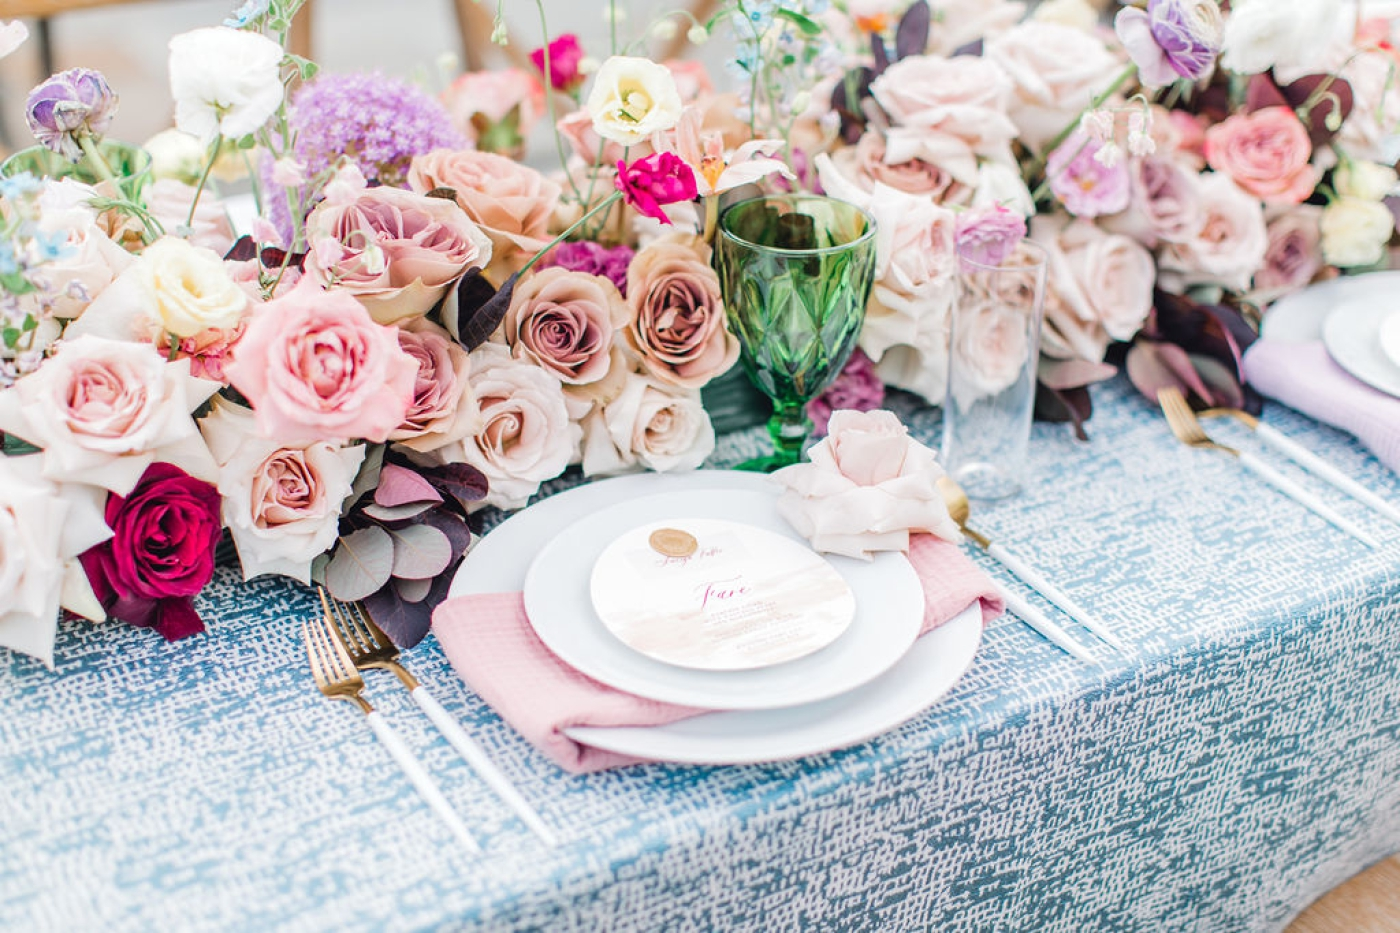 adding wax seals to your wedding decor